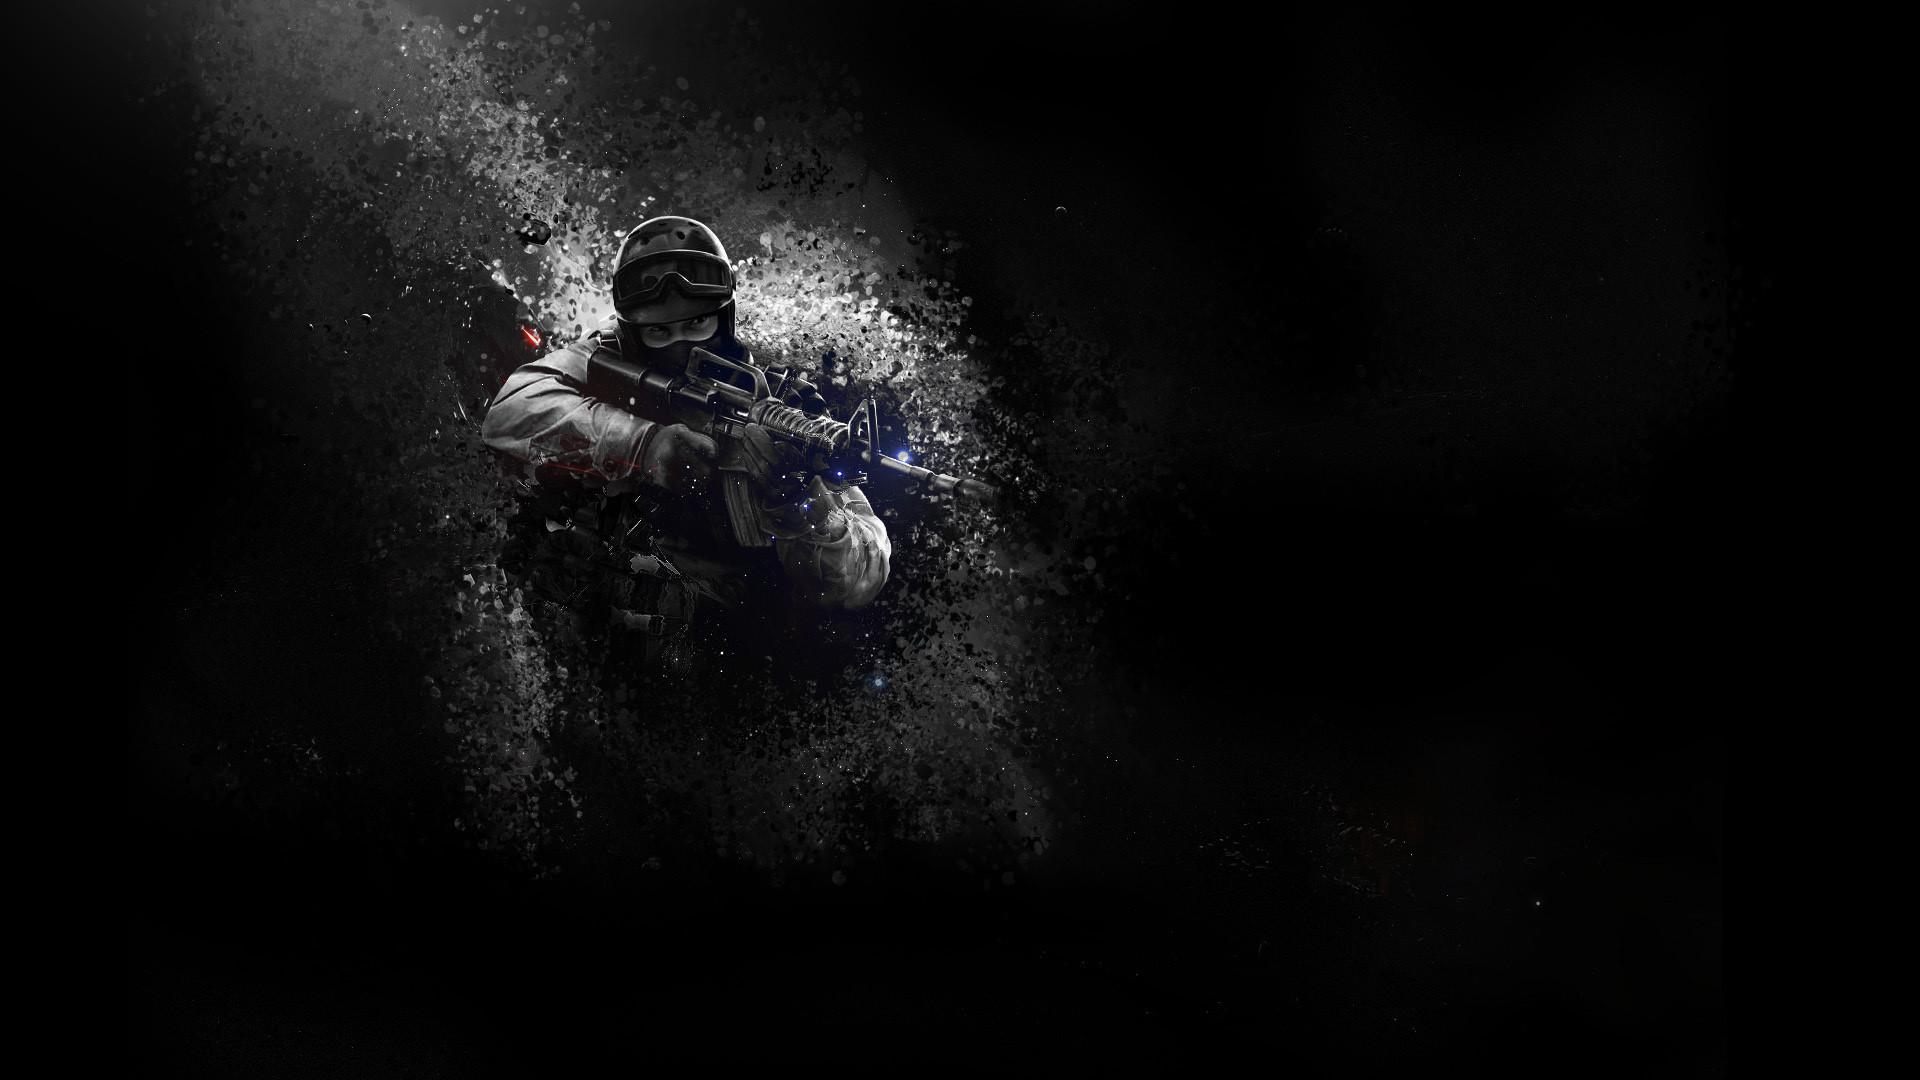 Counter Strike wallpaper background